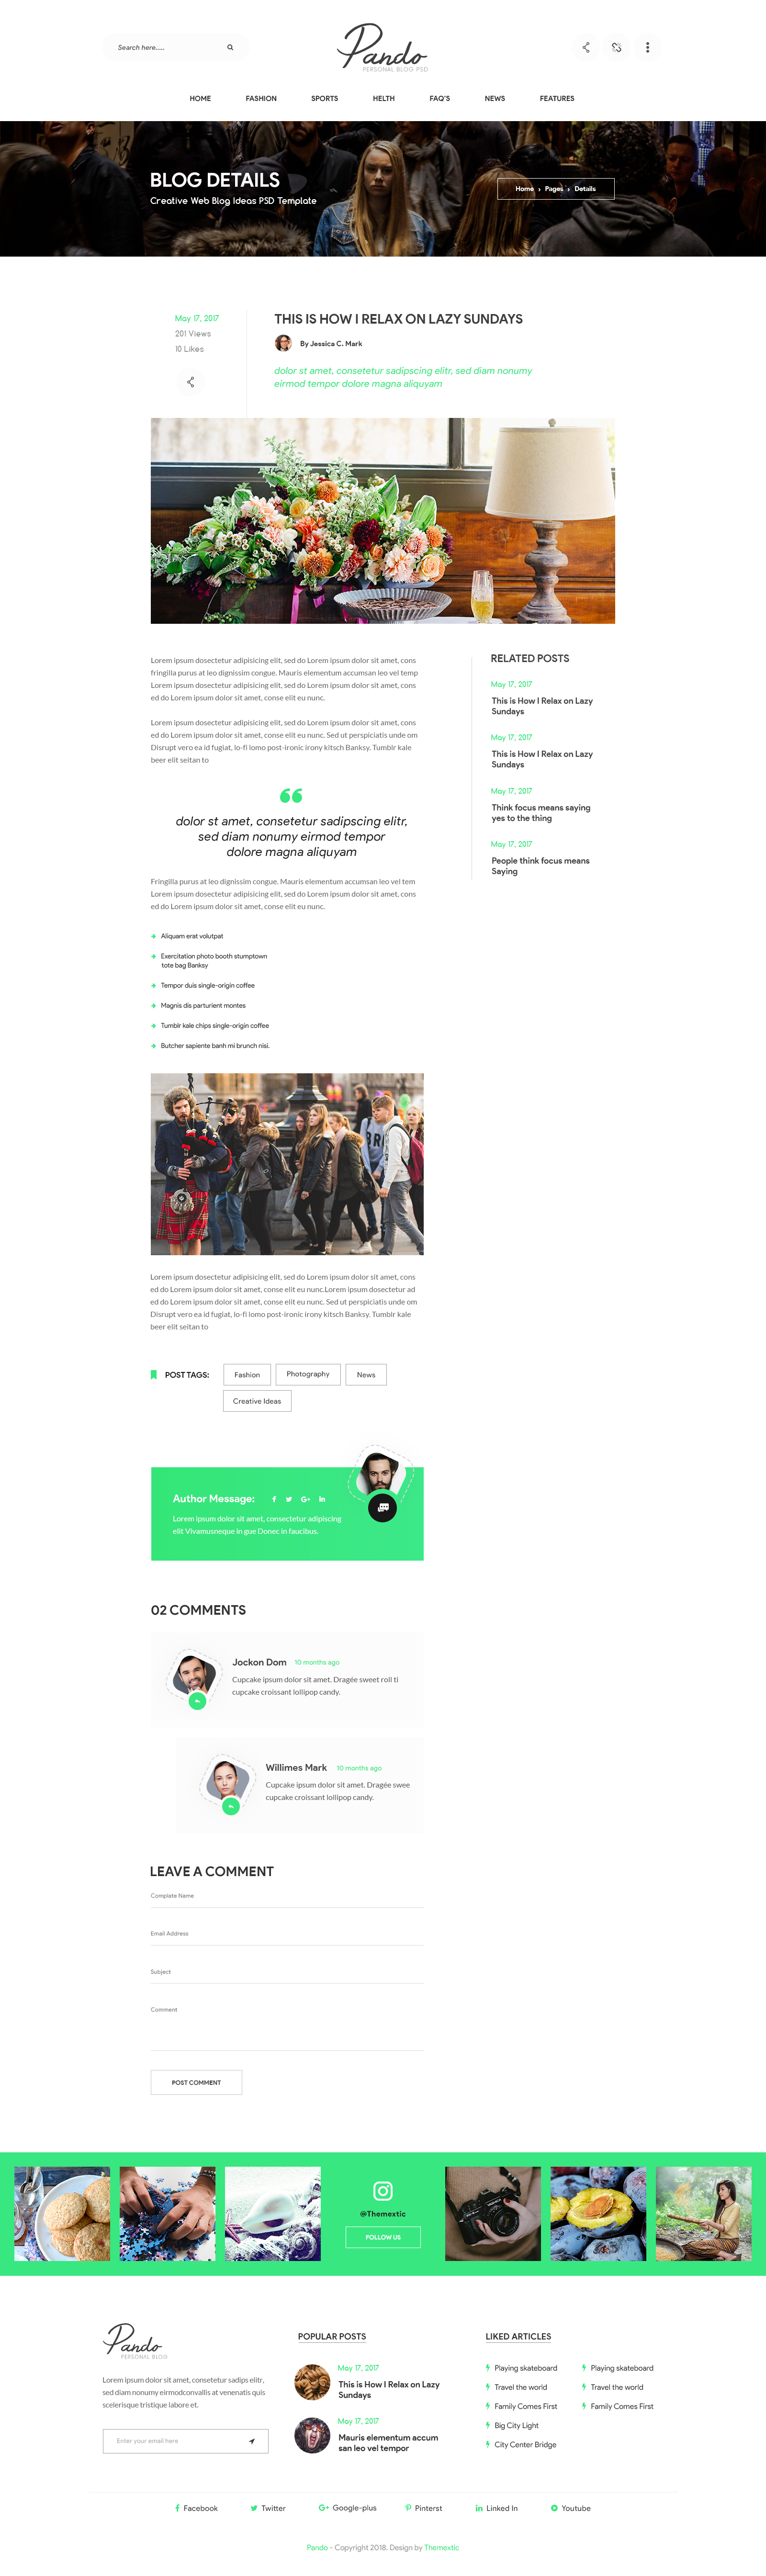 b7de62f3ea9 Pando - Personal Blog PSD Template by themextic